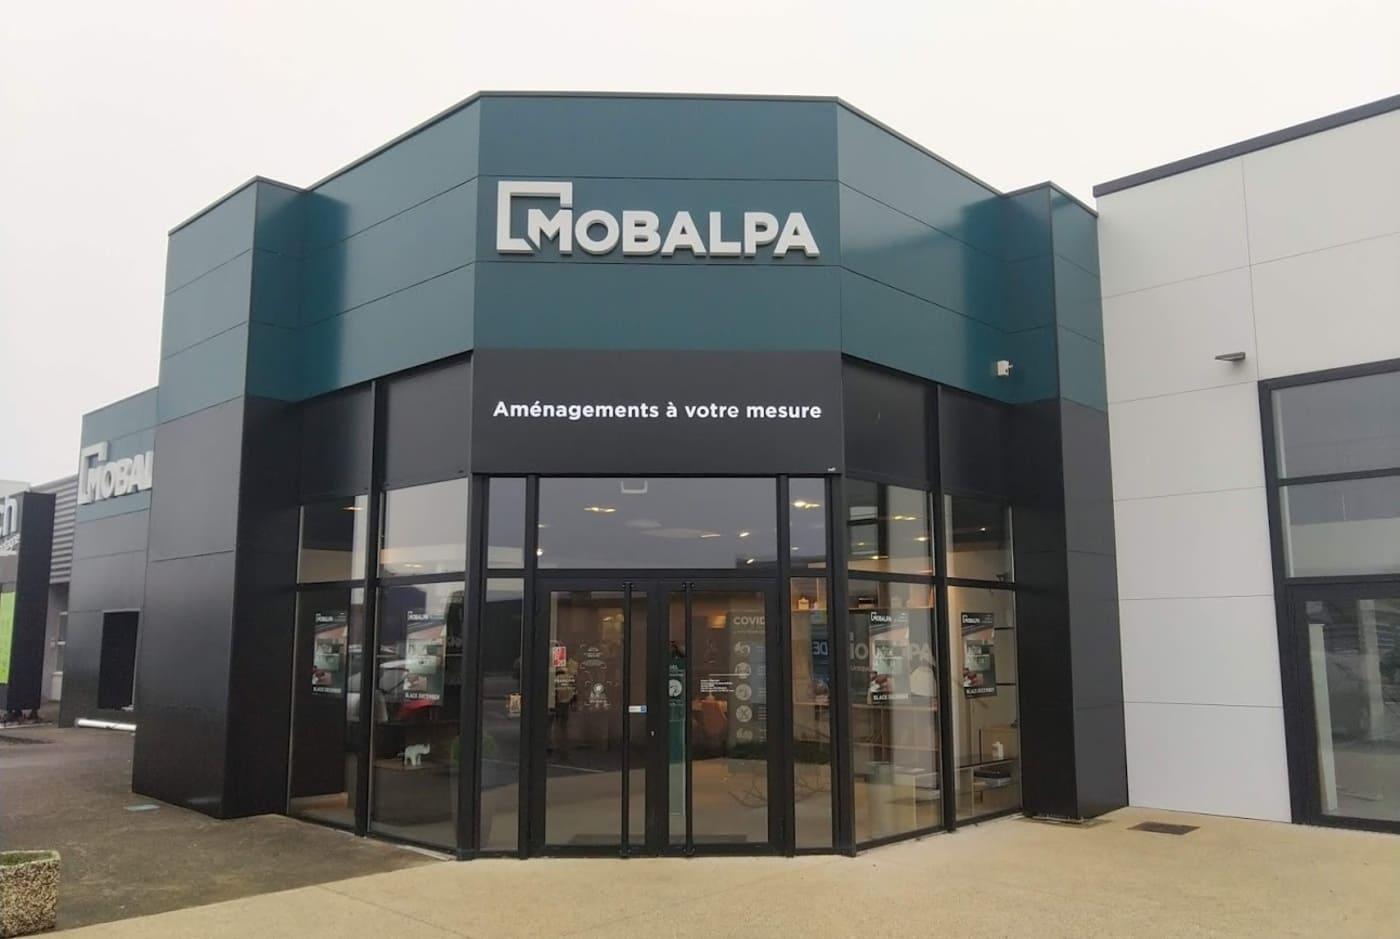 fabrication-et-pose-multisite-enseignes-magasins_mobalpa_par-visio